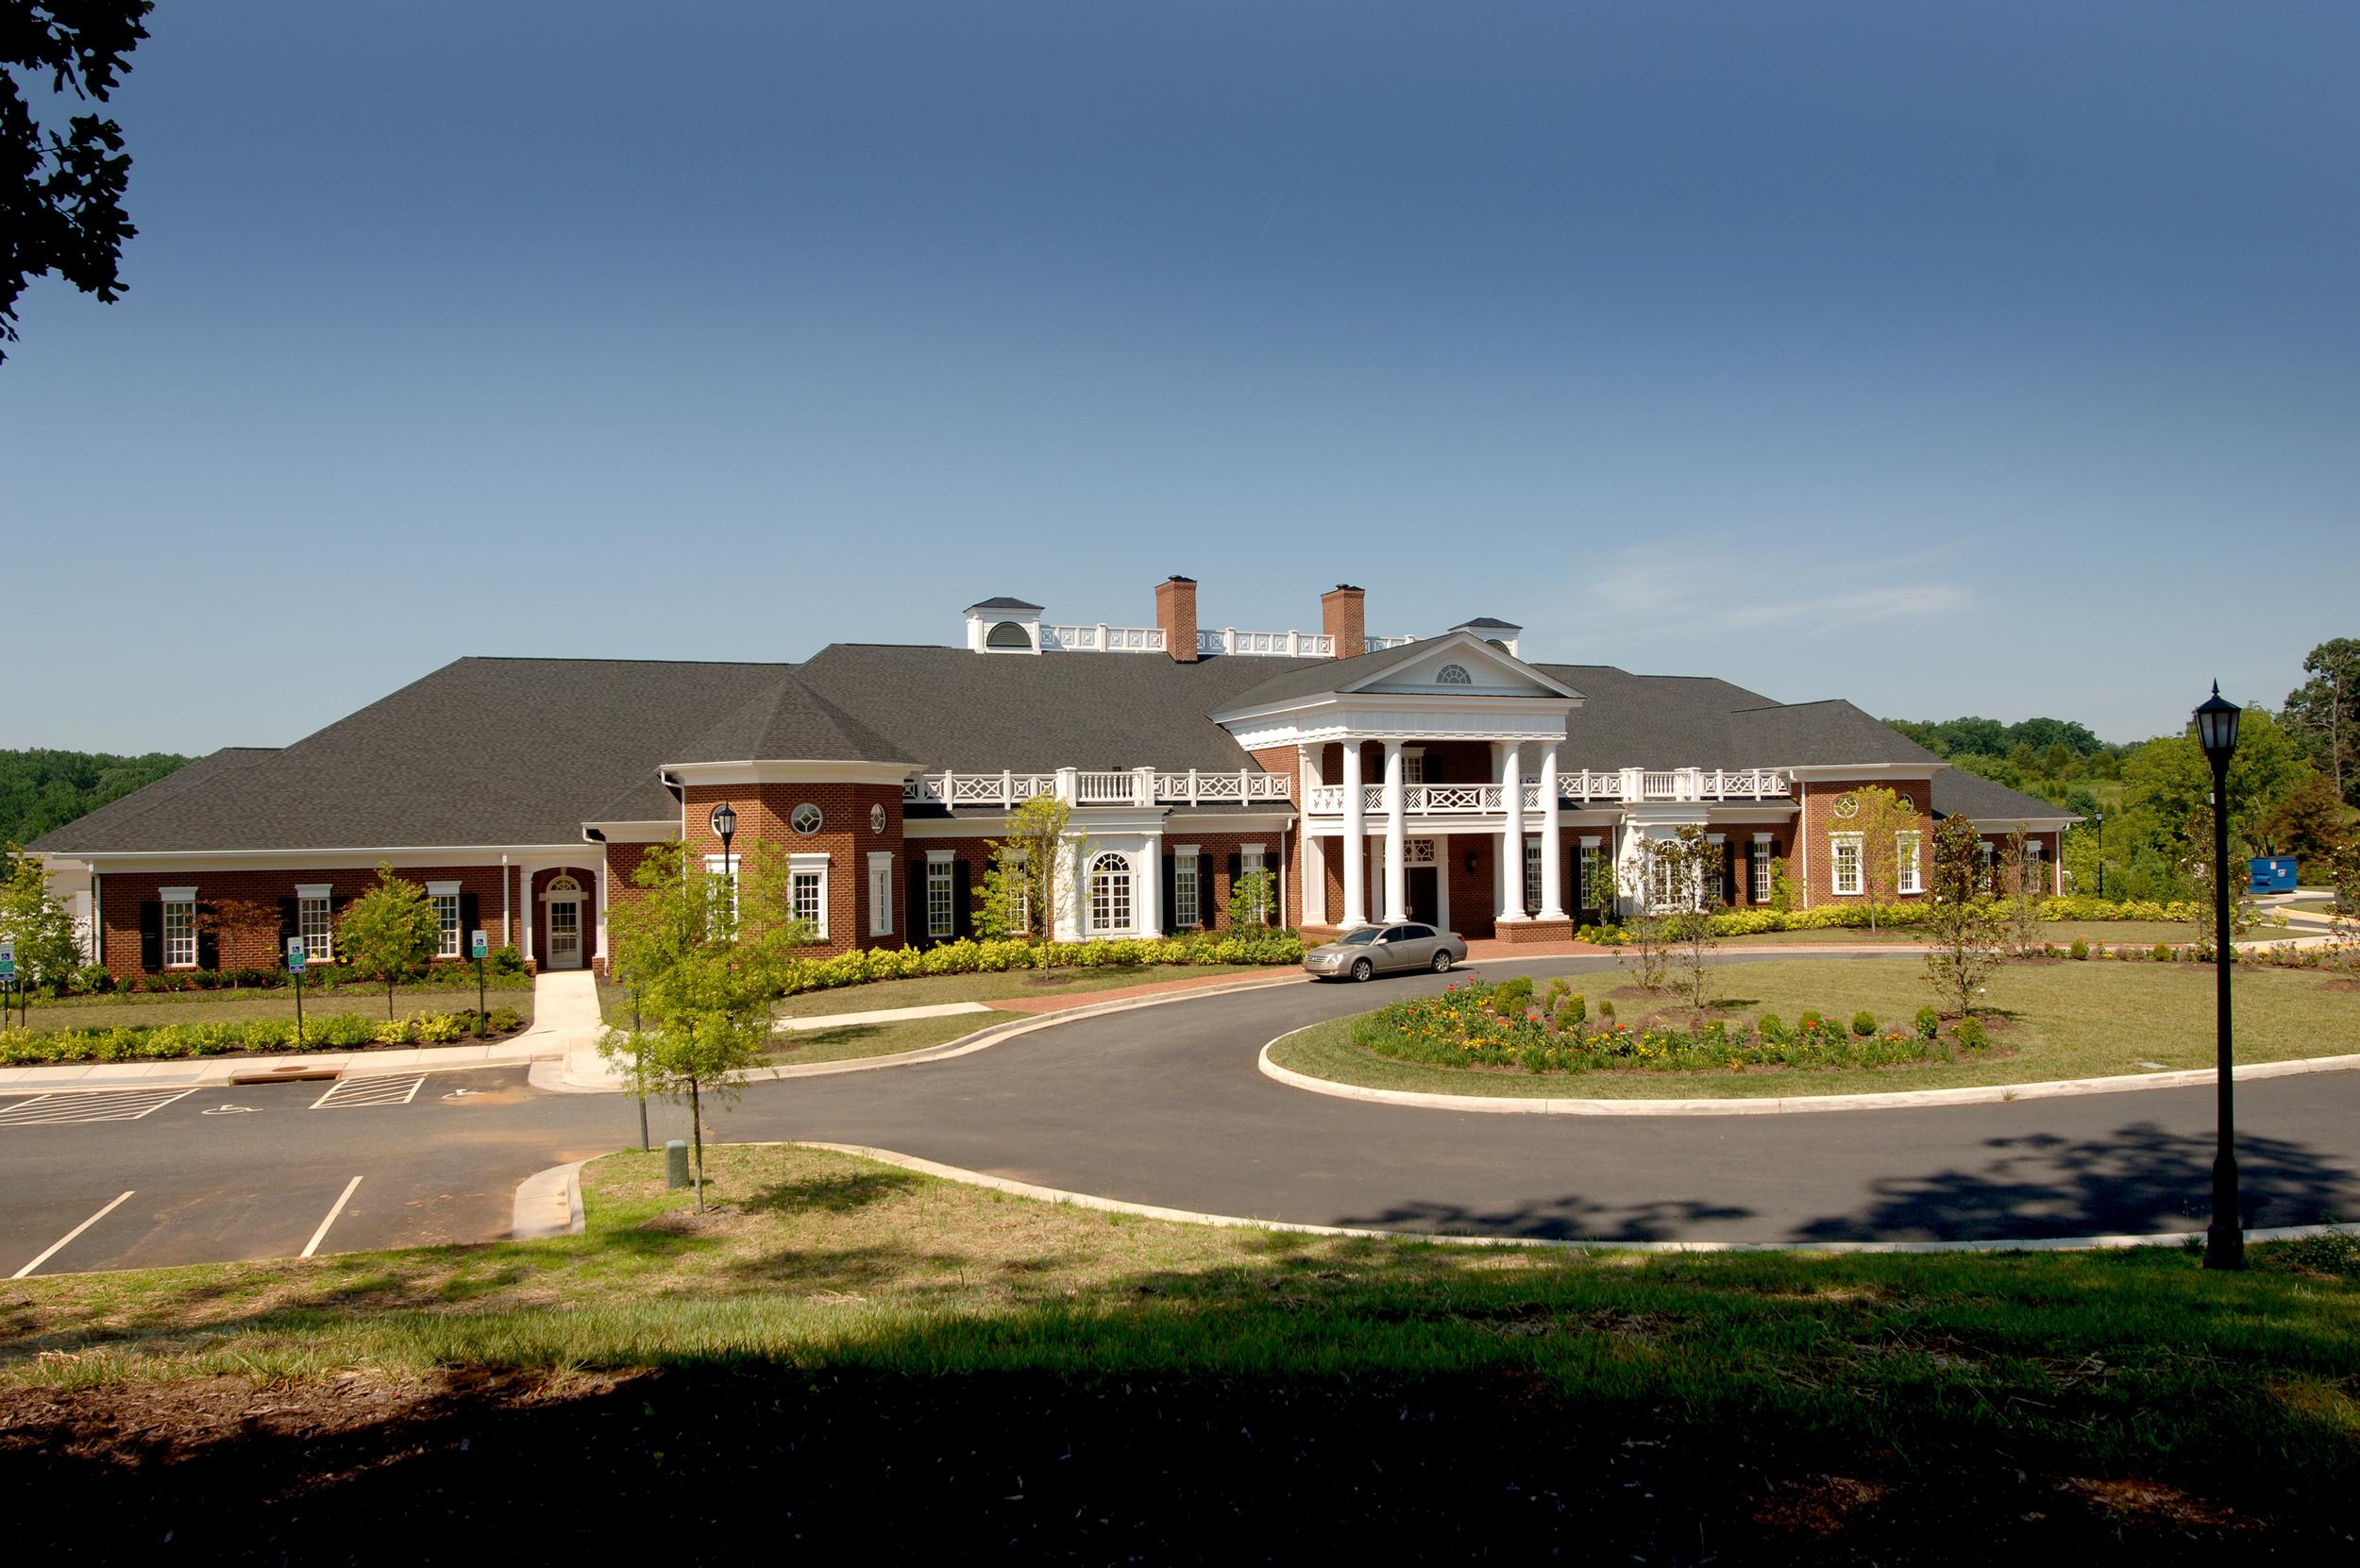 Four Seasons at Charlottesville Exterior